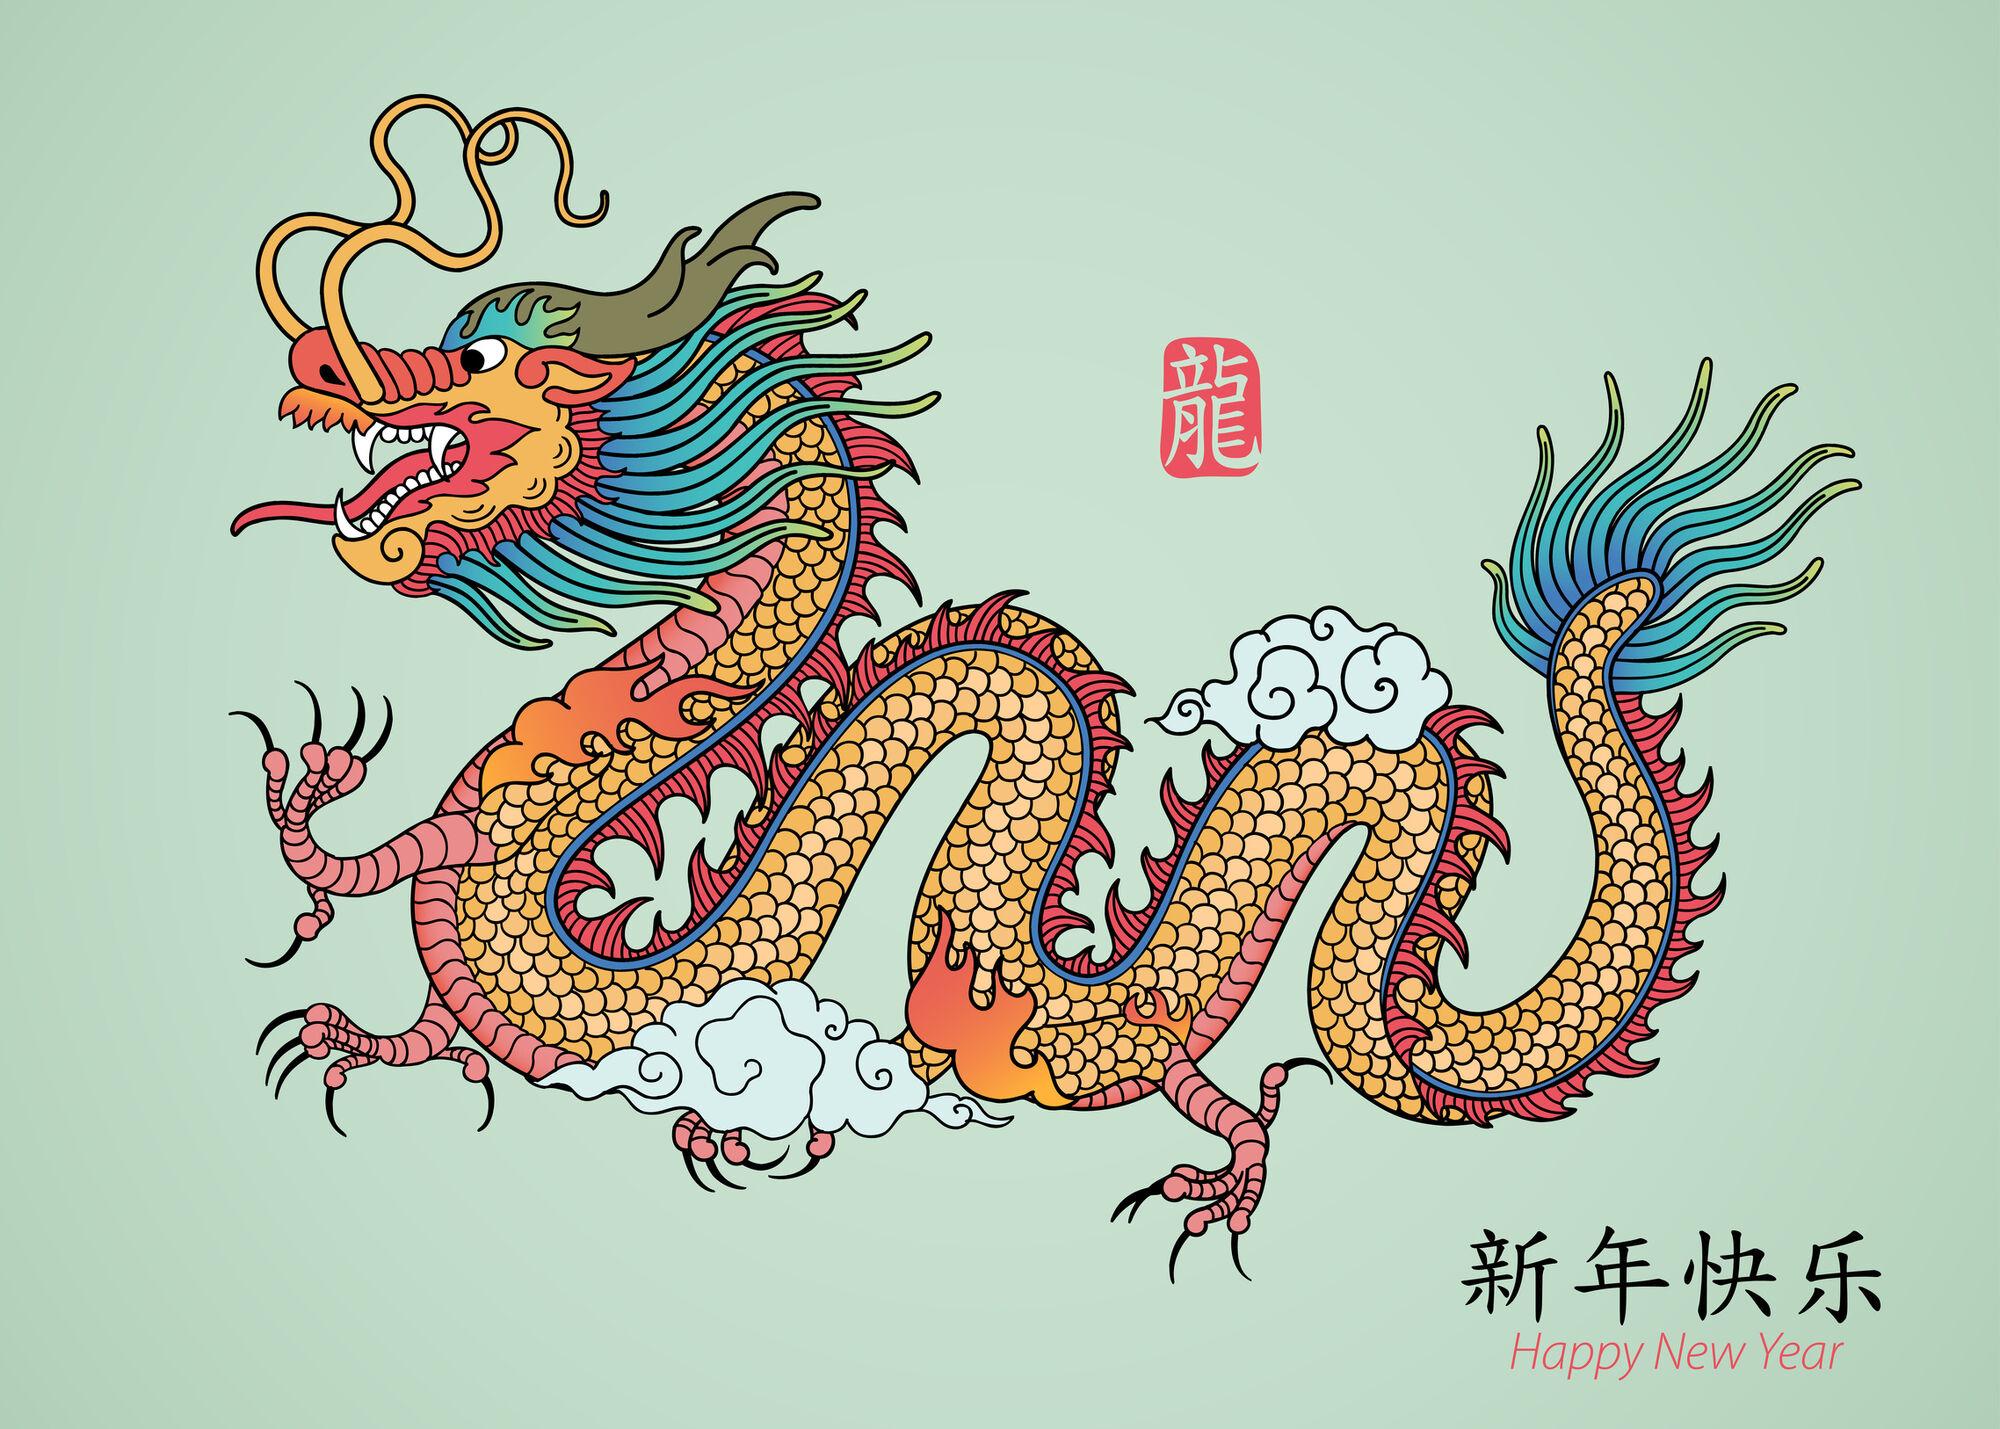 Dragon chinois wiki dragons fandom powered by wikia - Photo dragon chinois ...